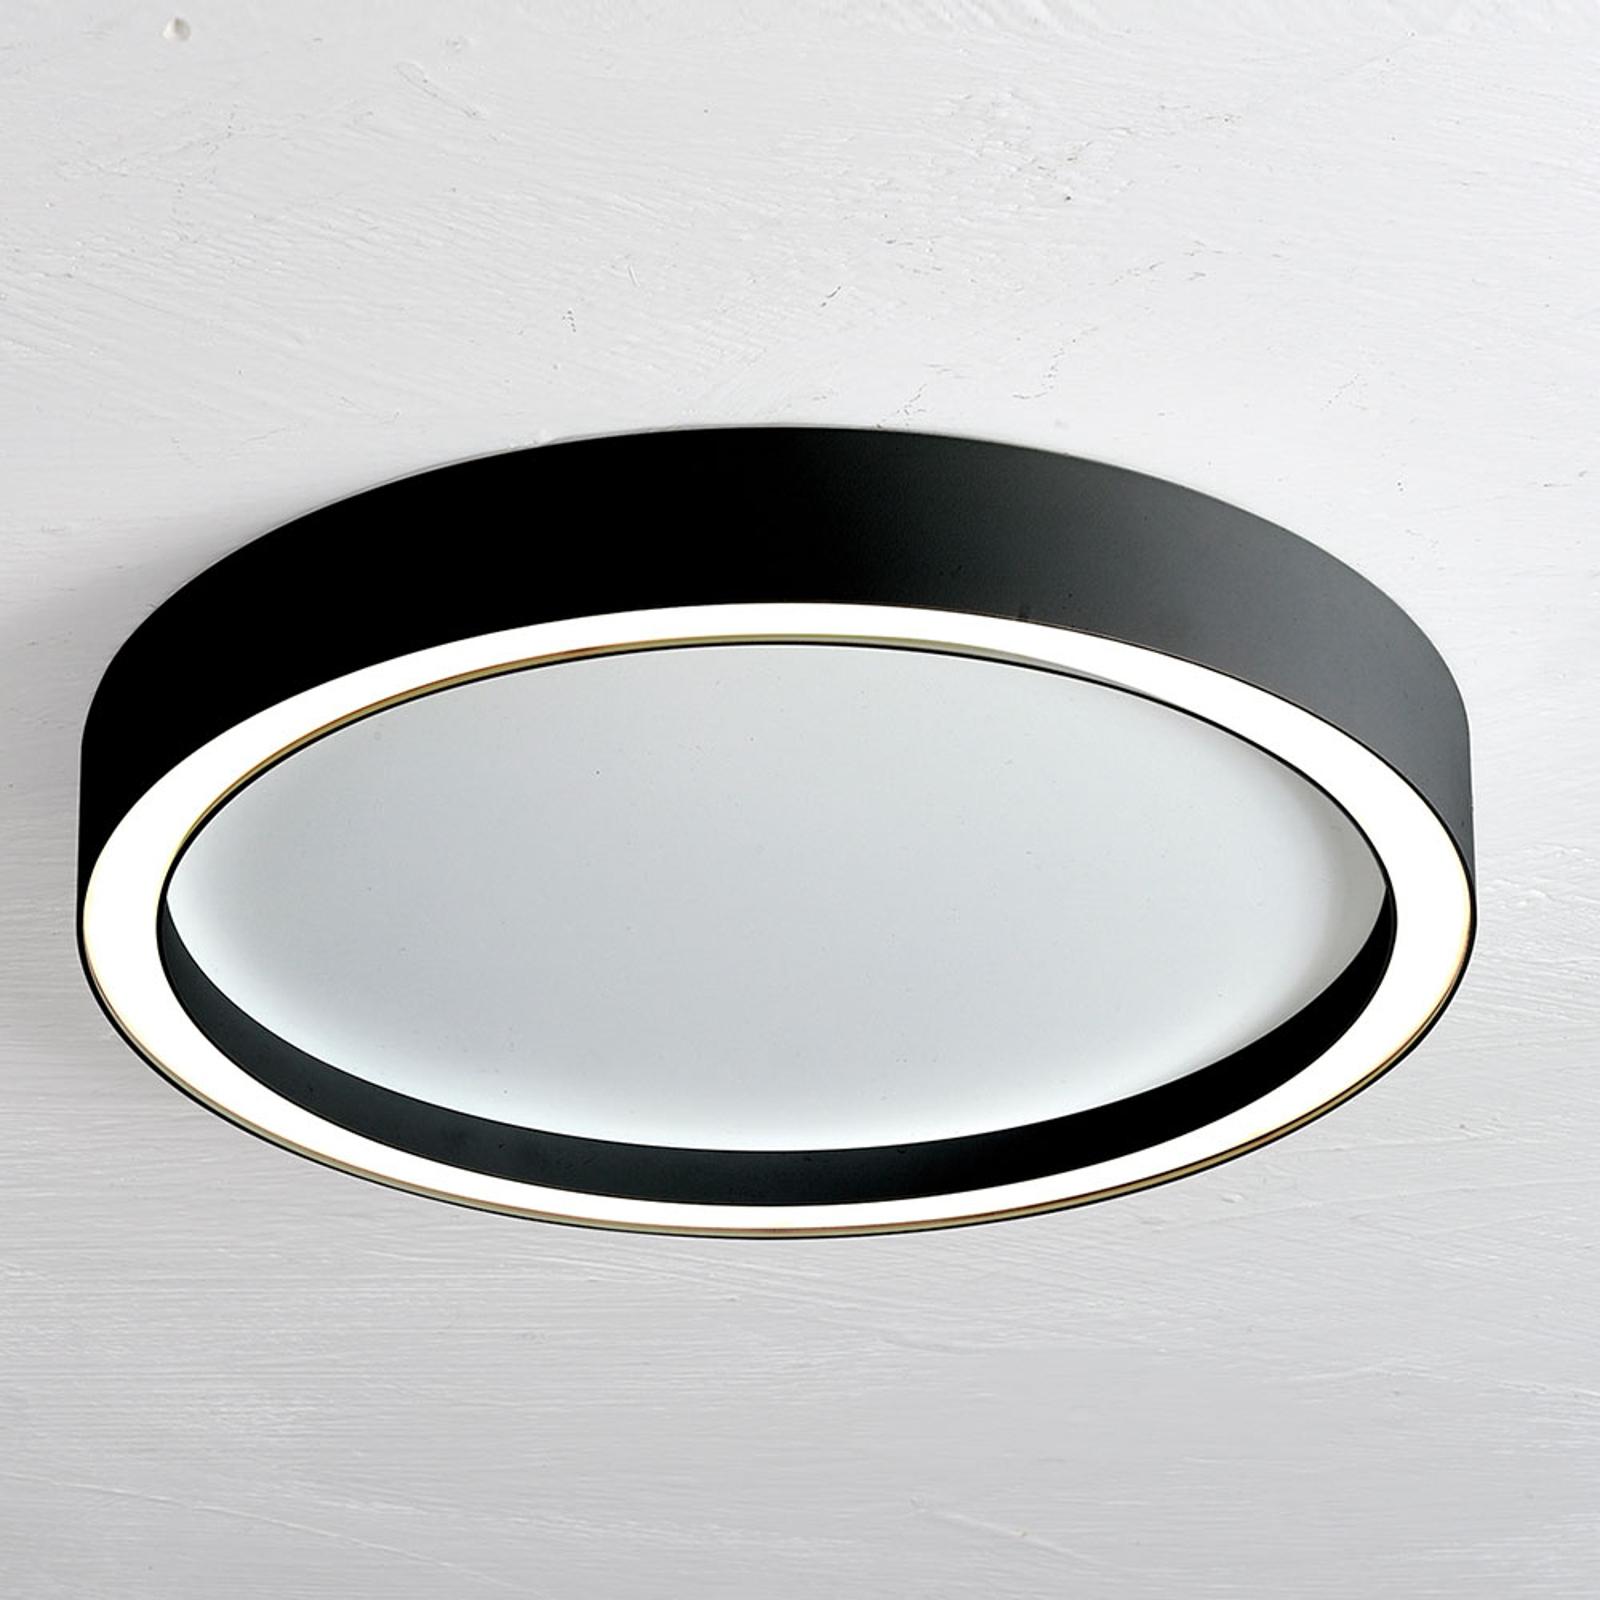 Bopp Aura LED plafondlamp Ø 30cm wit/zwart